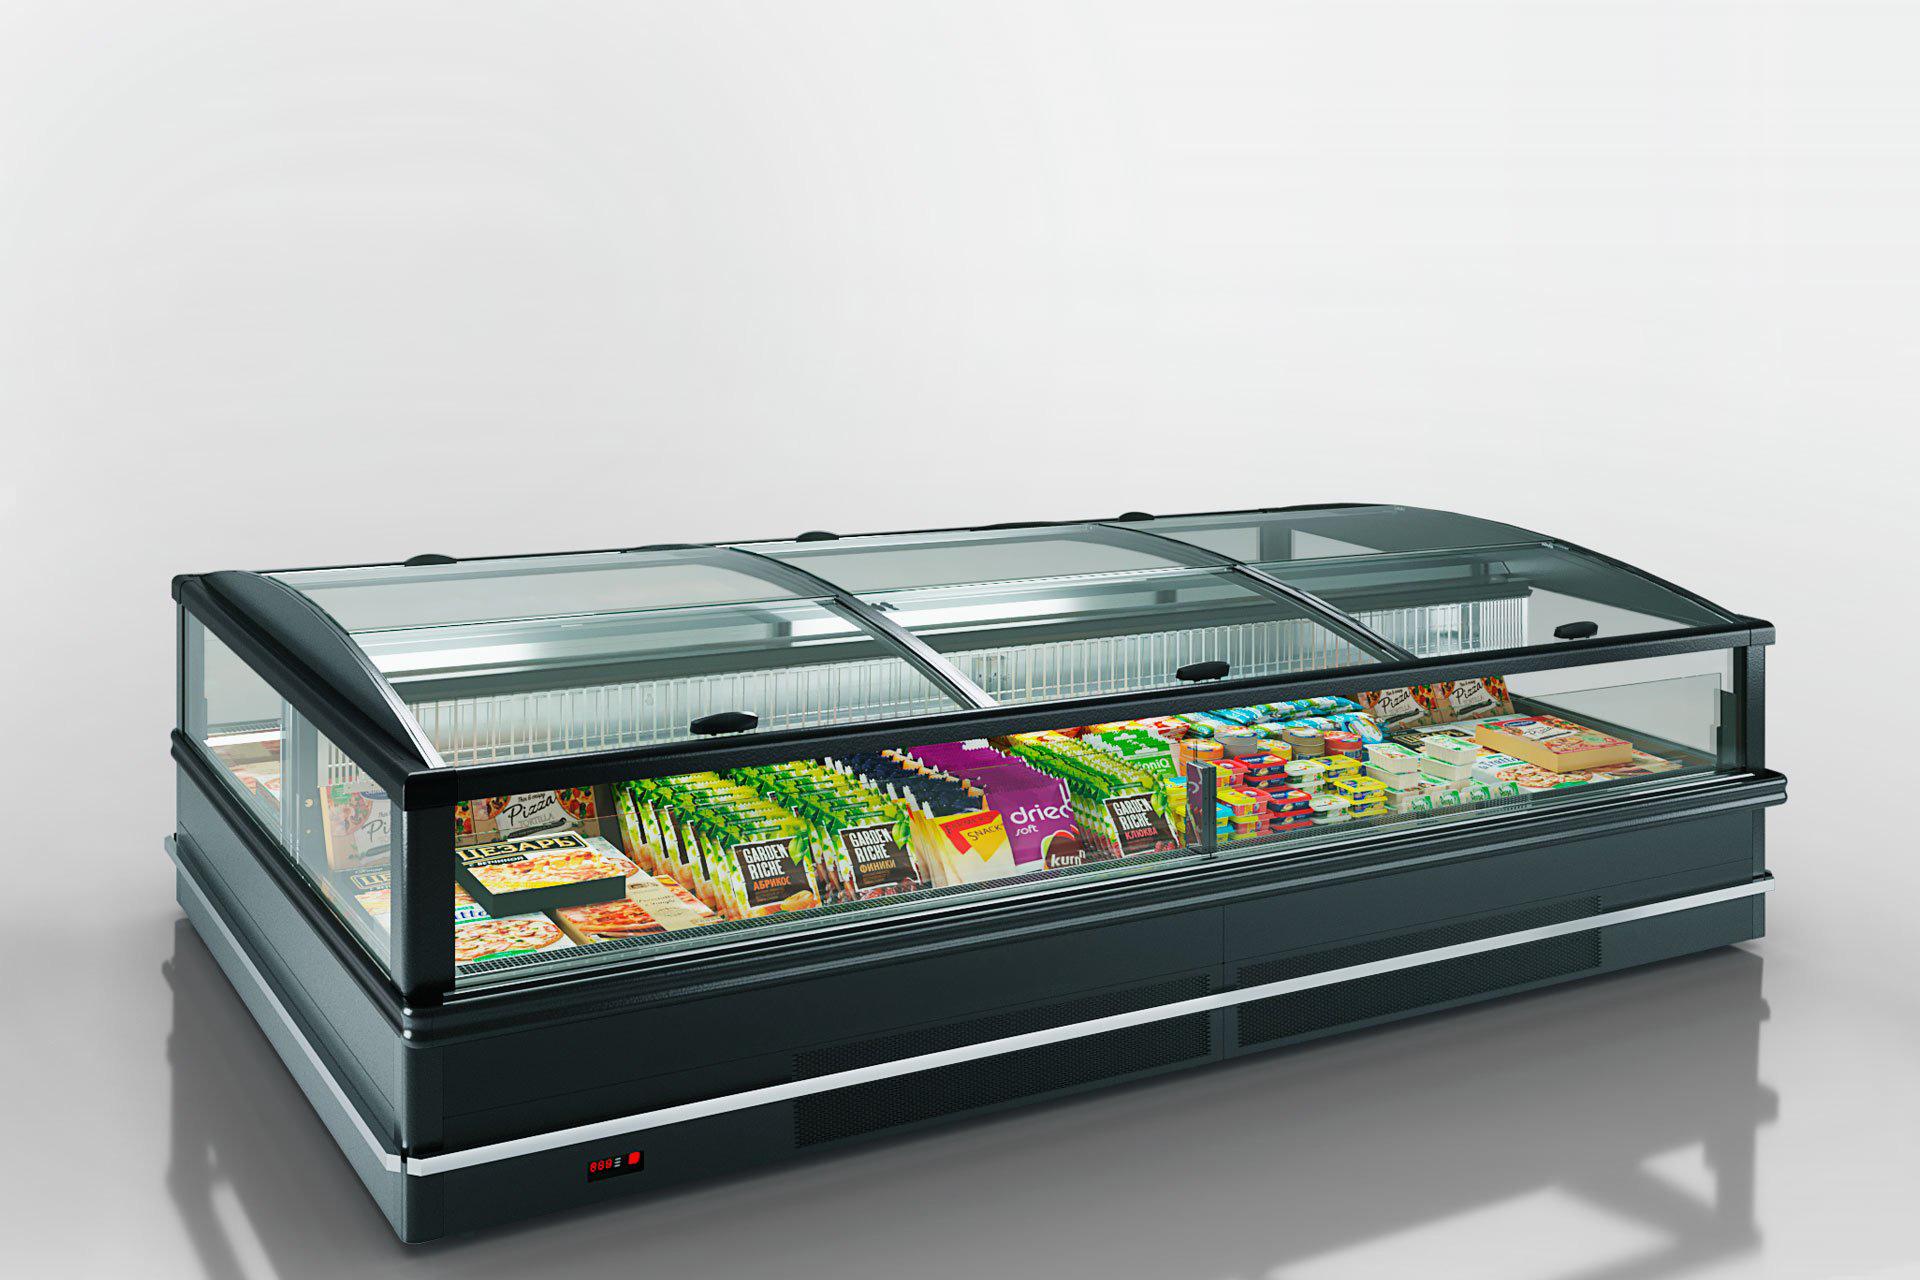 Frozen foods unit Alaska DE AH 160/200 LT C 100-SLA